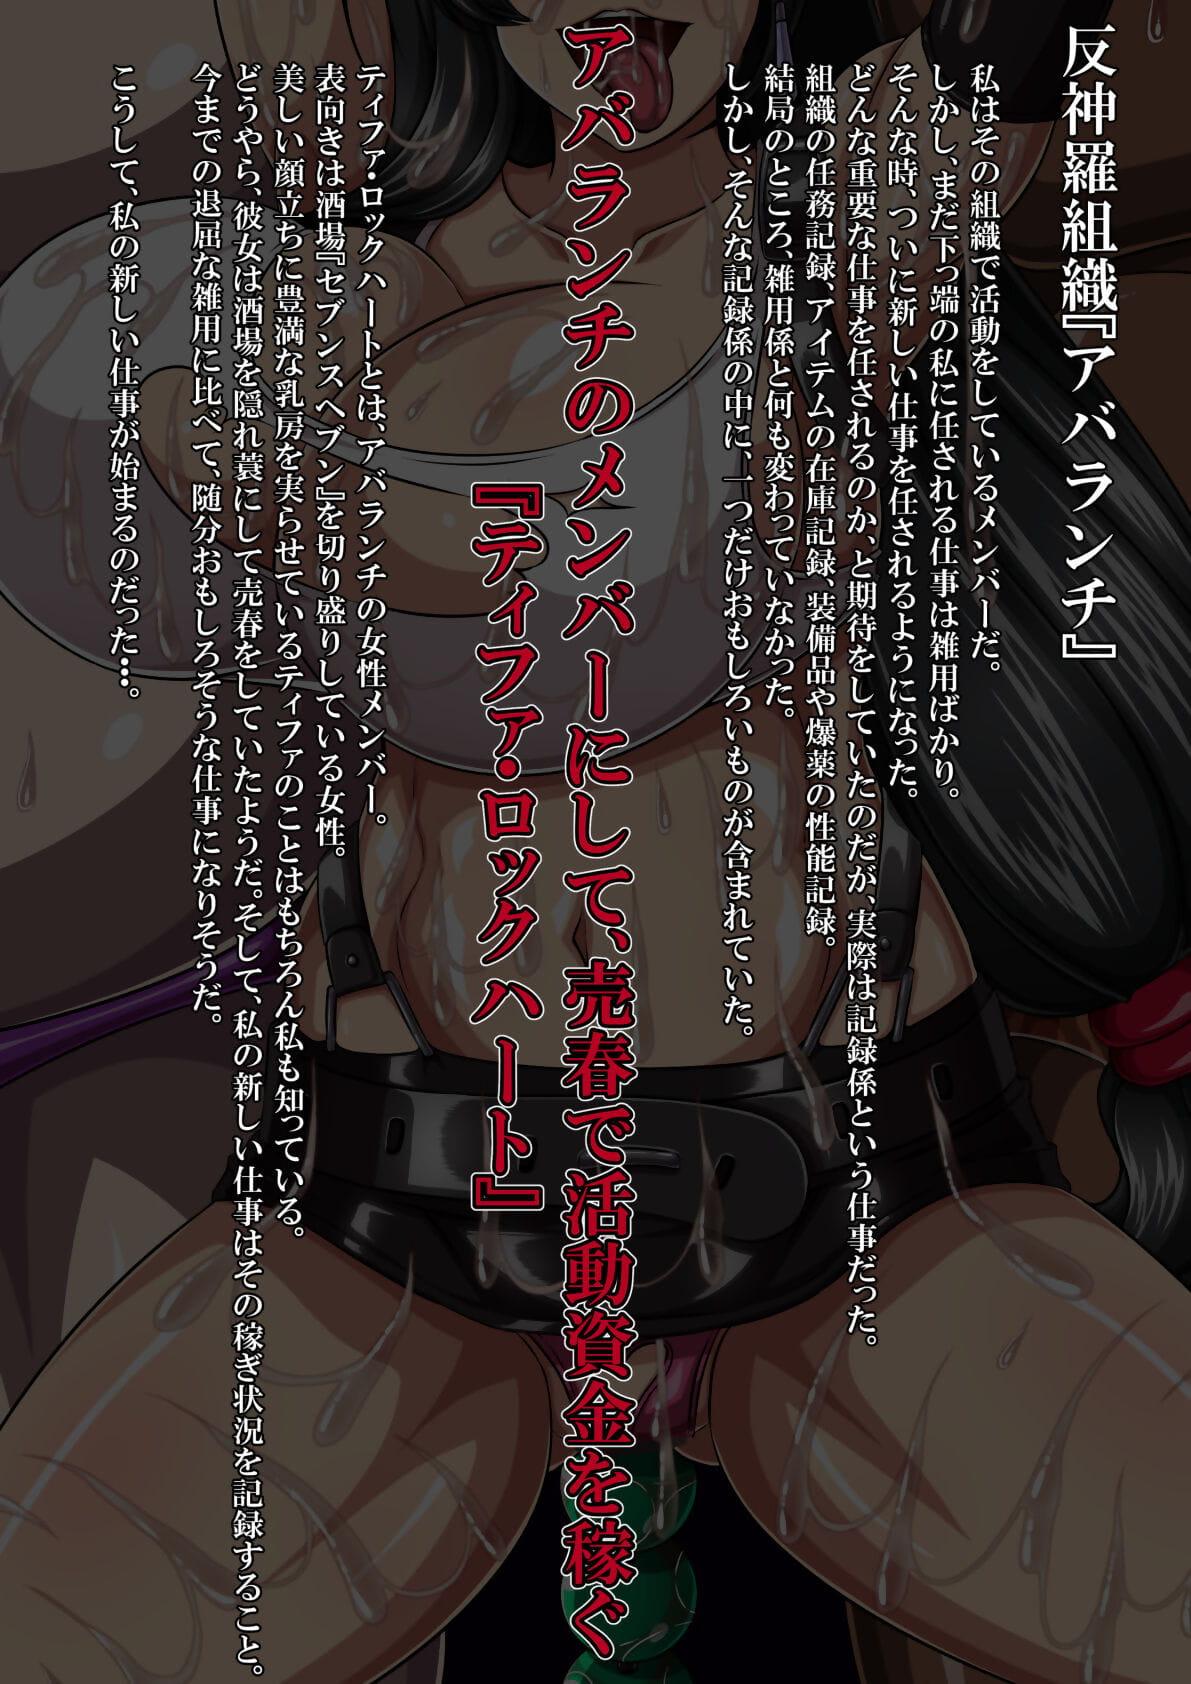 Slum-gai bantam Baita ~Dosukebe Assembly de Katsudou Shikin o Kasegu Onna Tifa~ - accoutrement 3